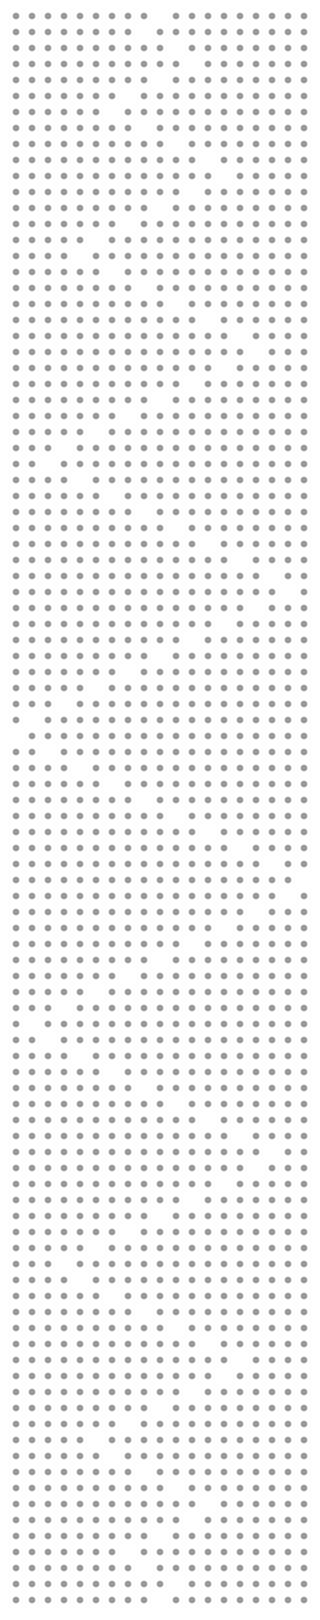 assets_art_580_shuffle_grid_1